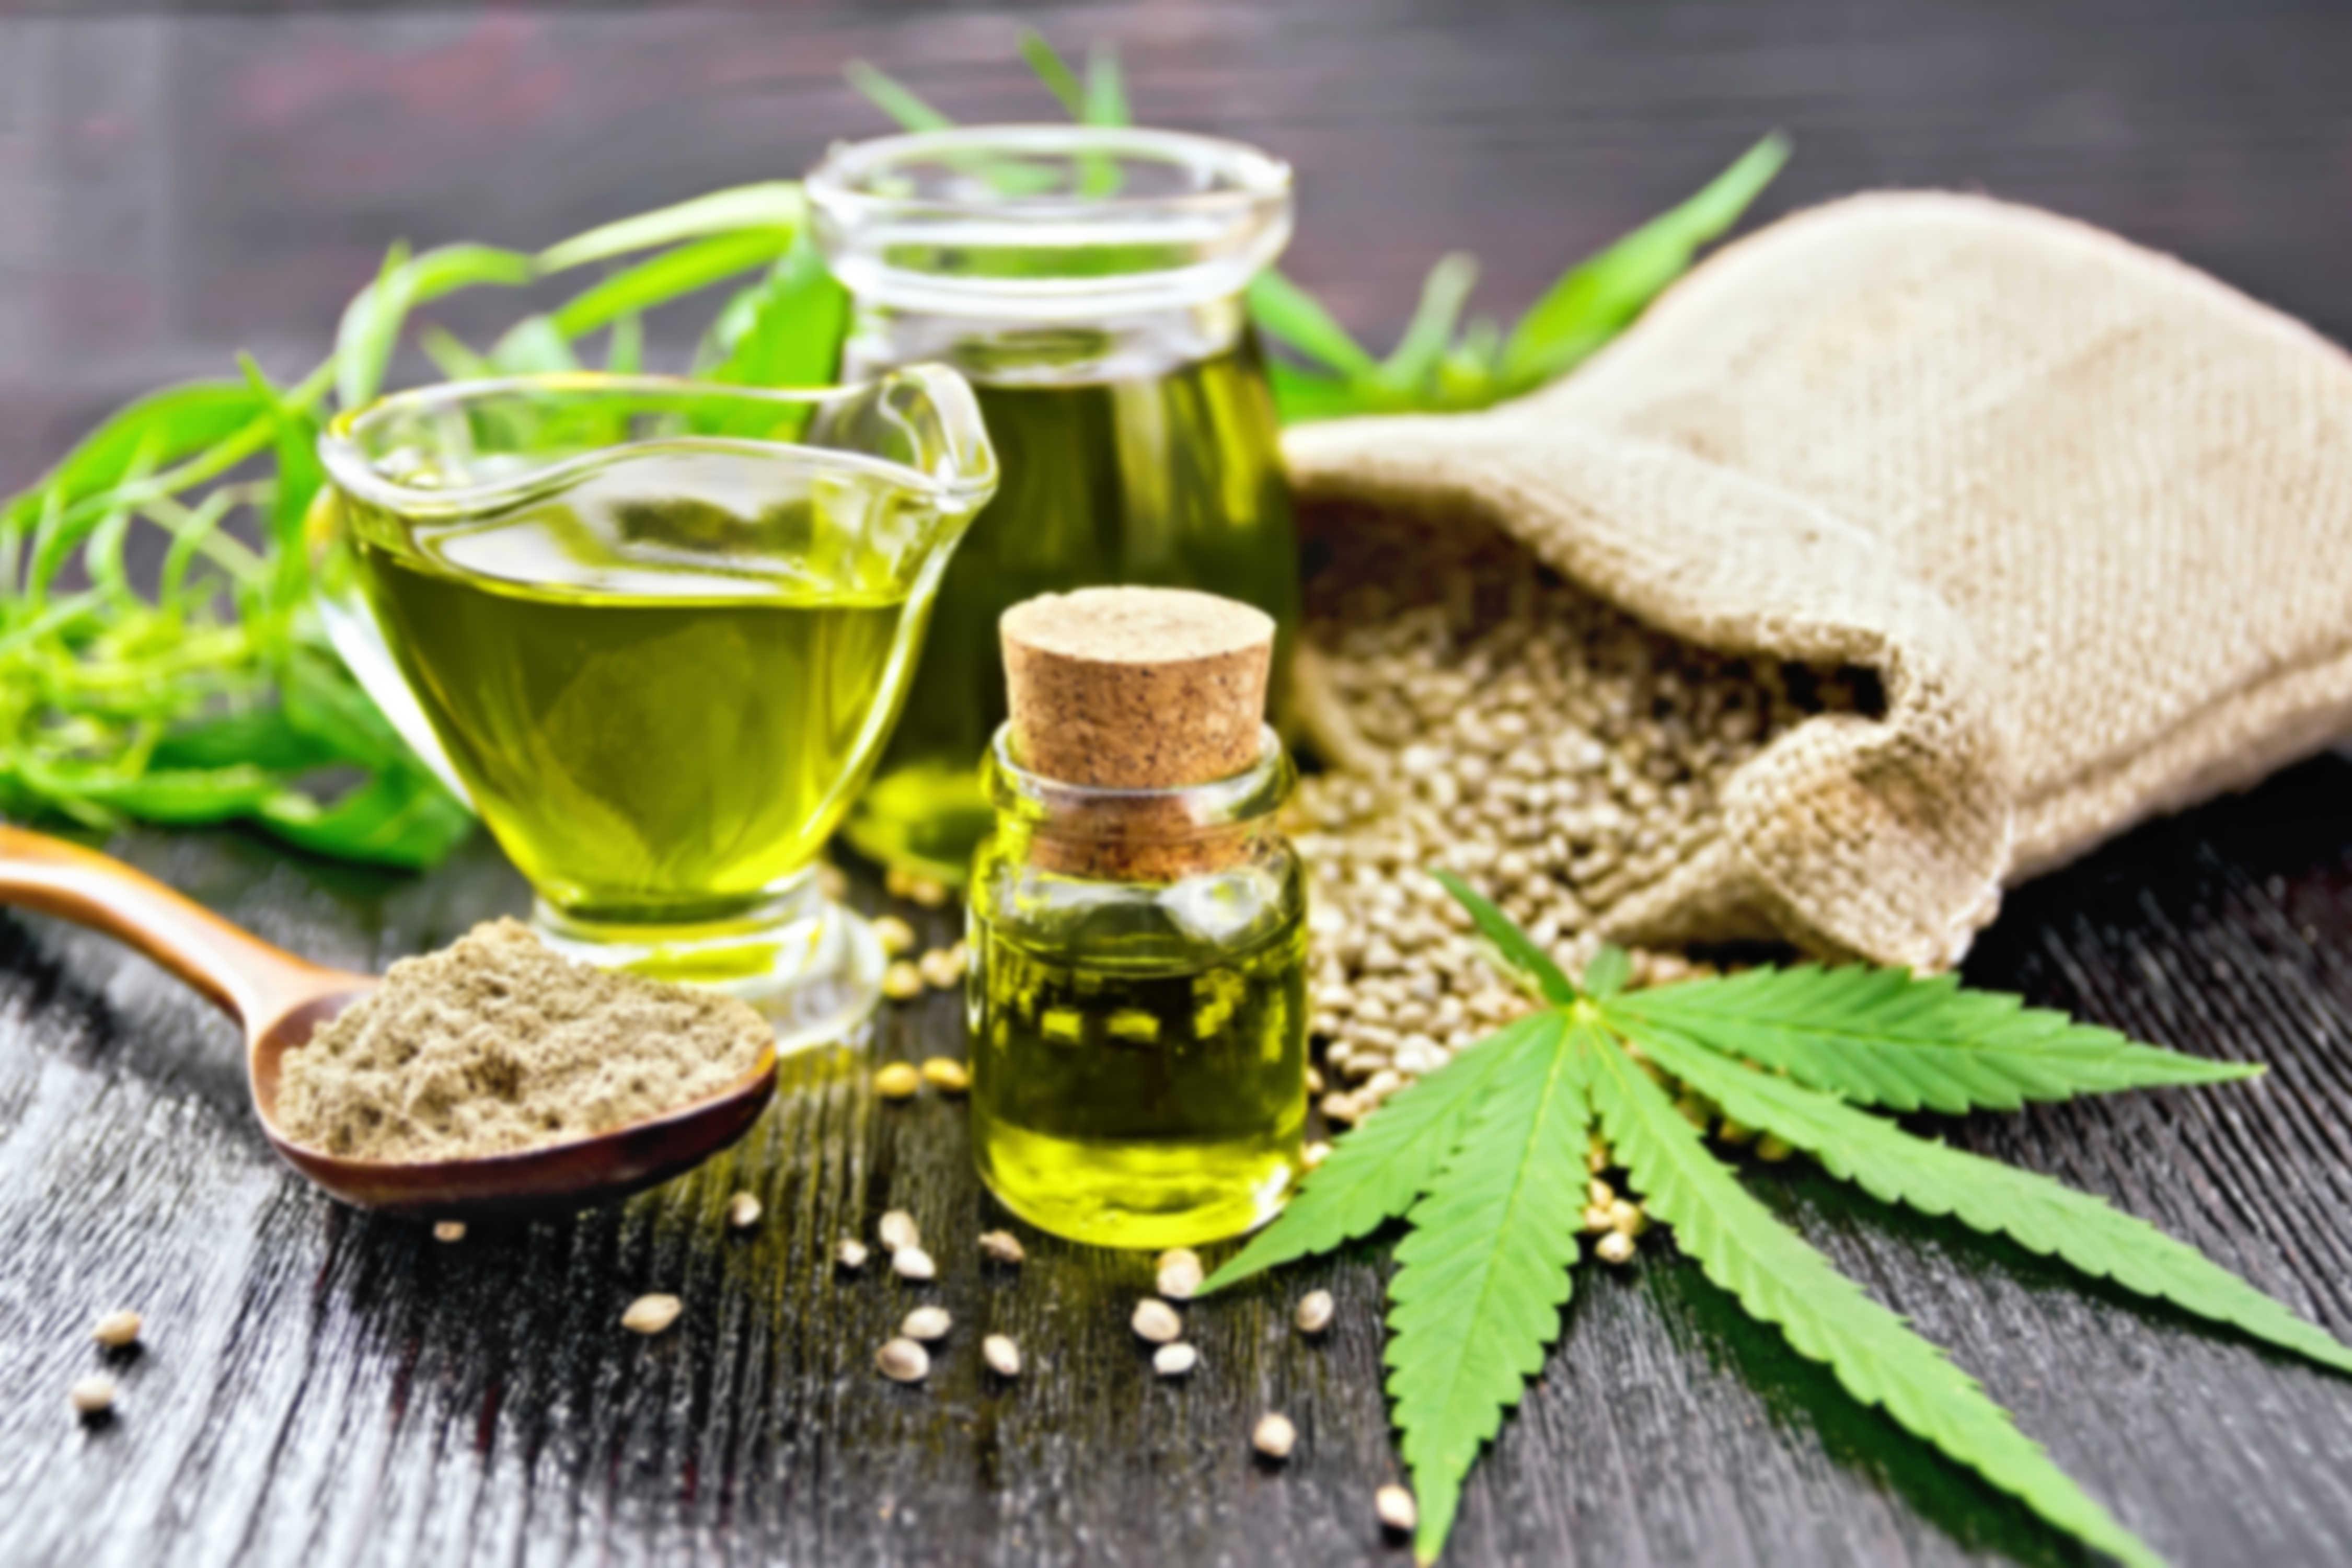 Dermactiva cannabis sativa seed